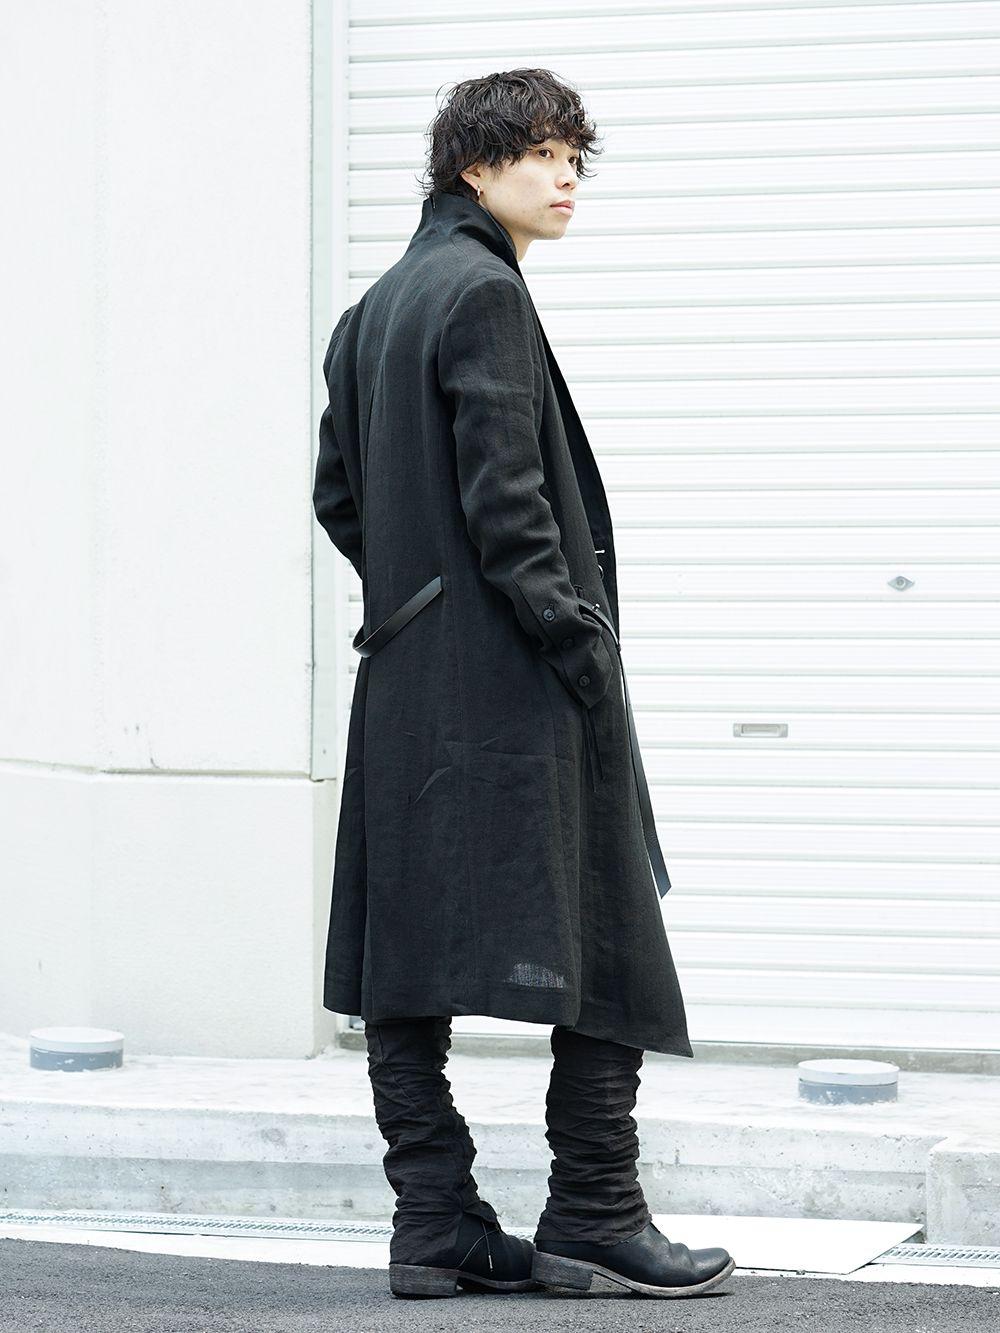 D.hygen[SADDAM TEISSY] 19SS cool black style - 4-003